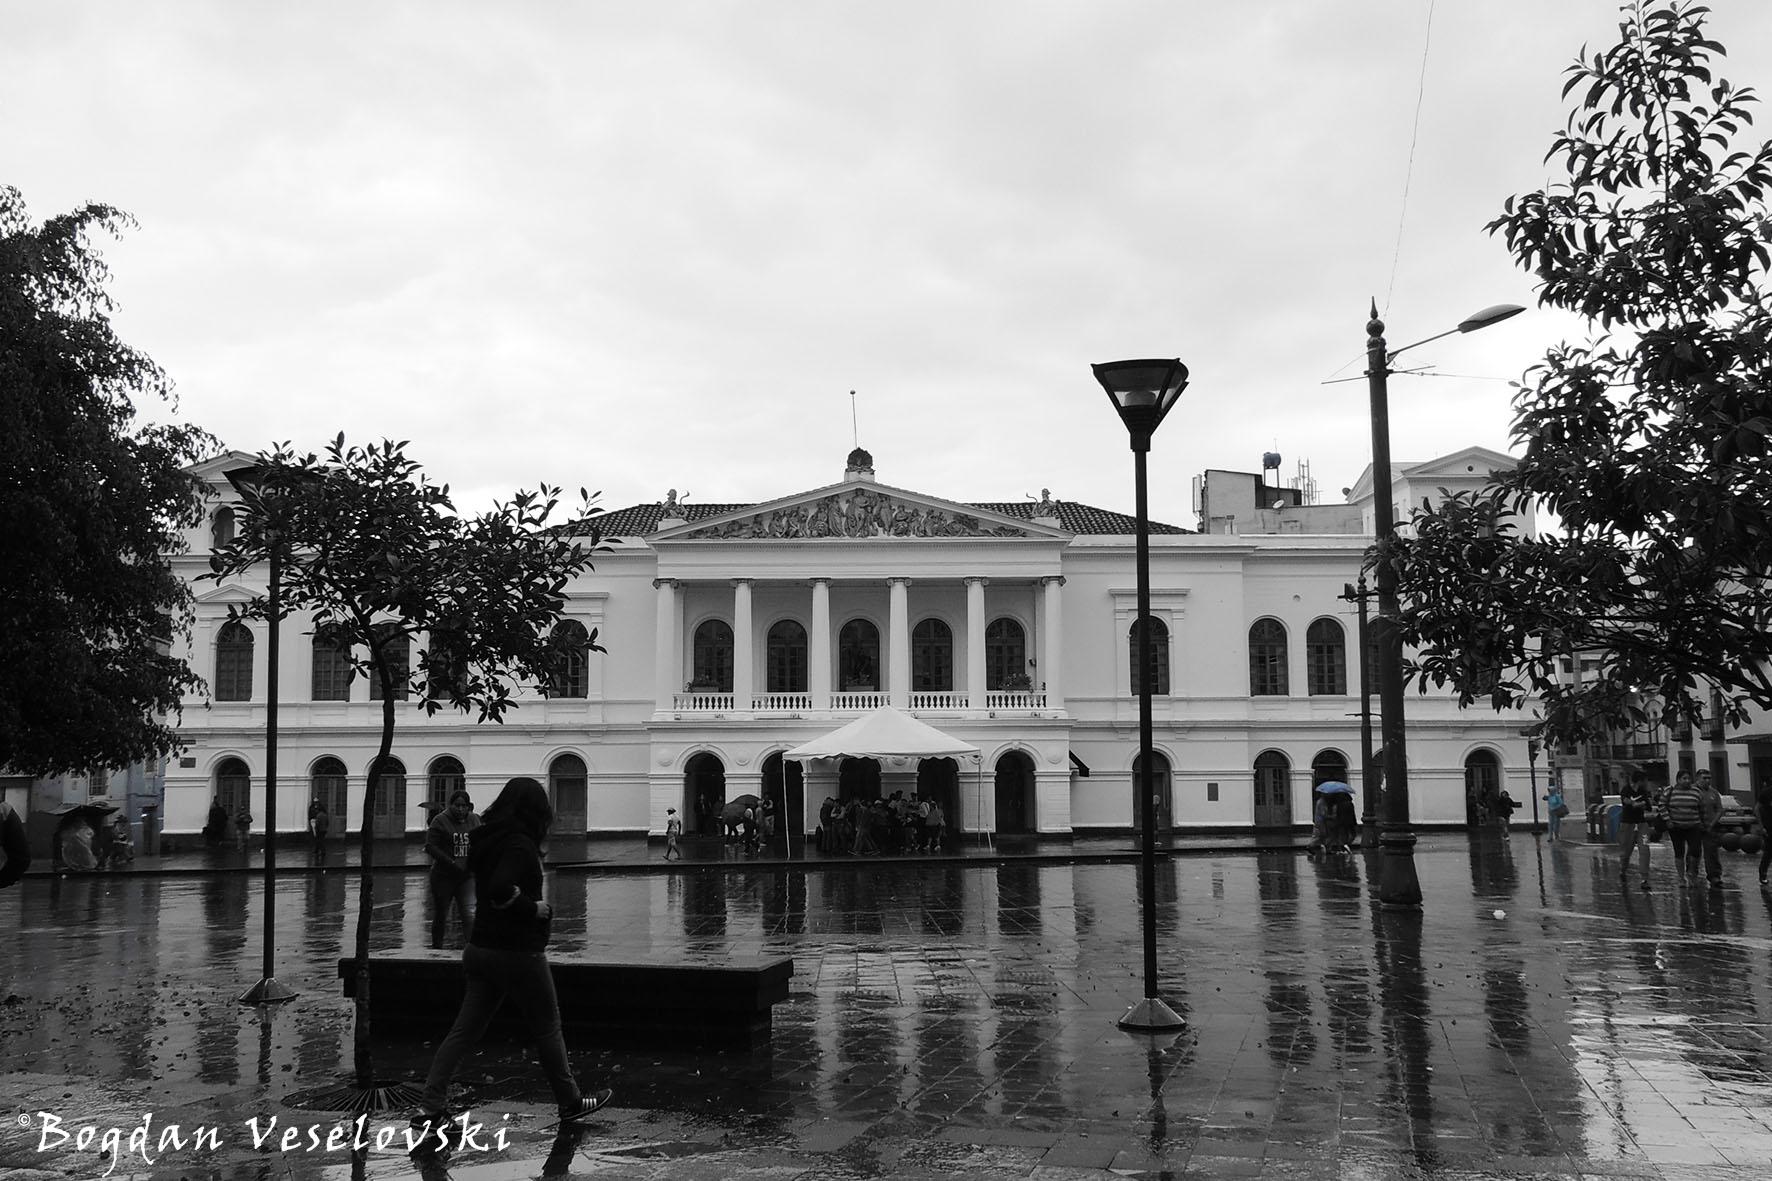 Casco Histórico (Historic Center)